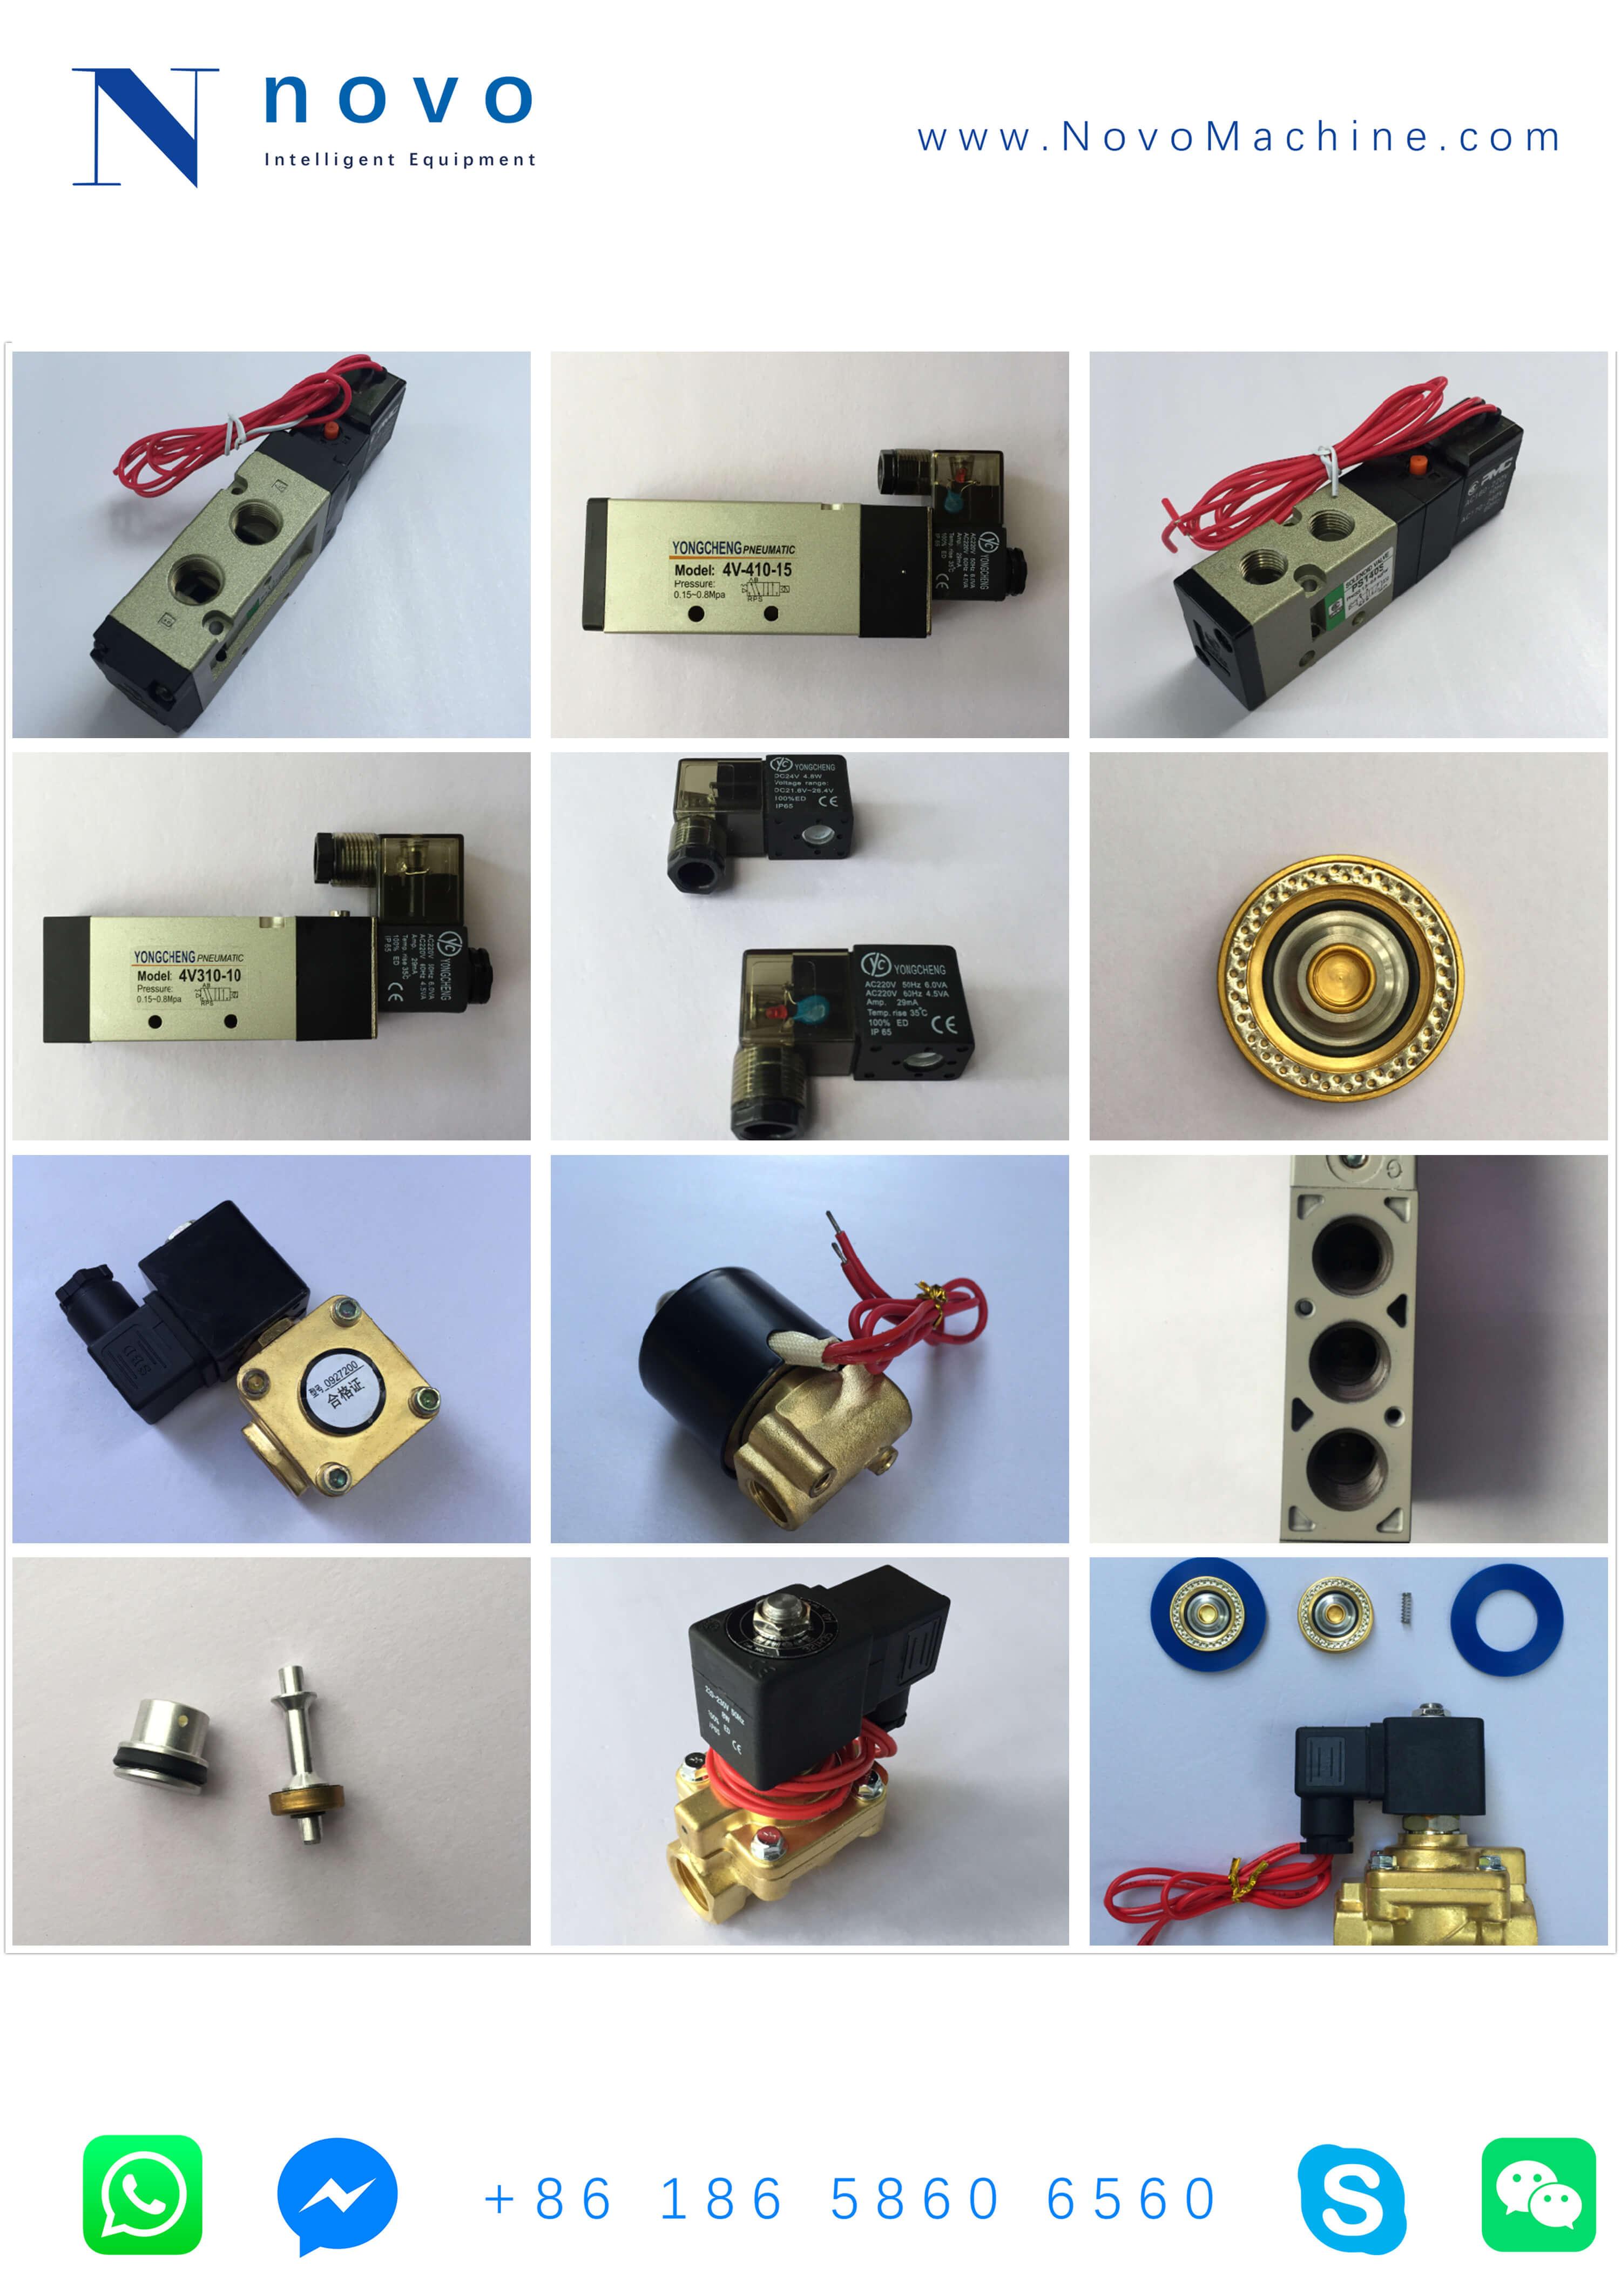 Solenoid-Valve-Spare-parts-for-Novo-PET plastic -bottle-blowing-molding-machine